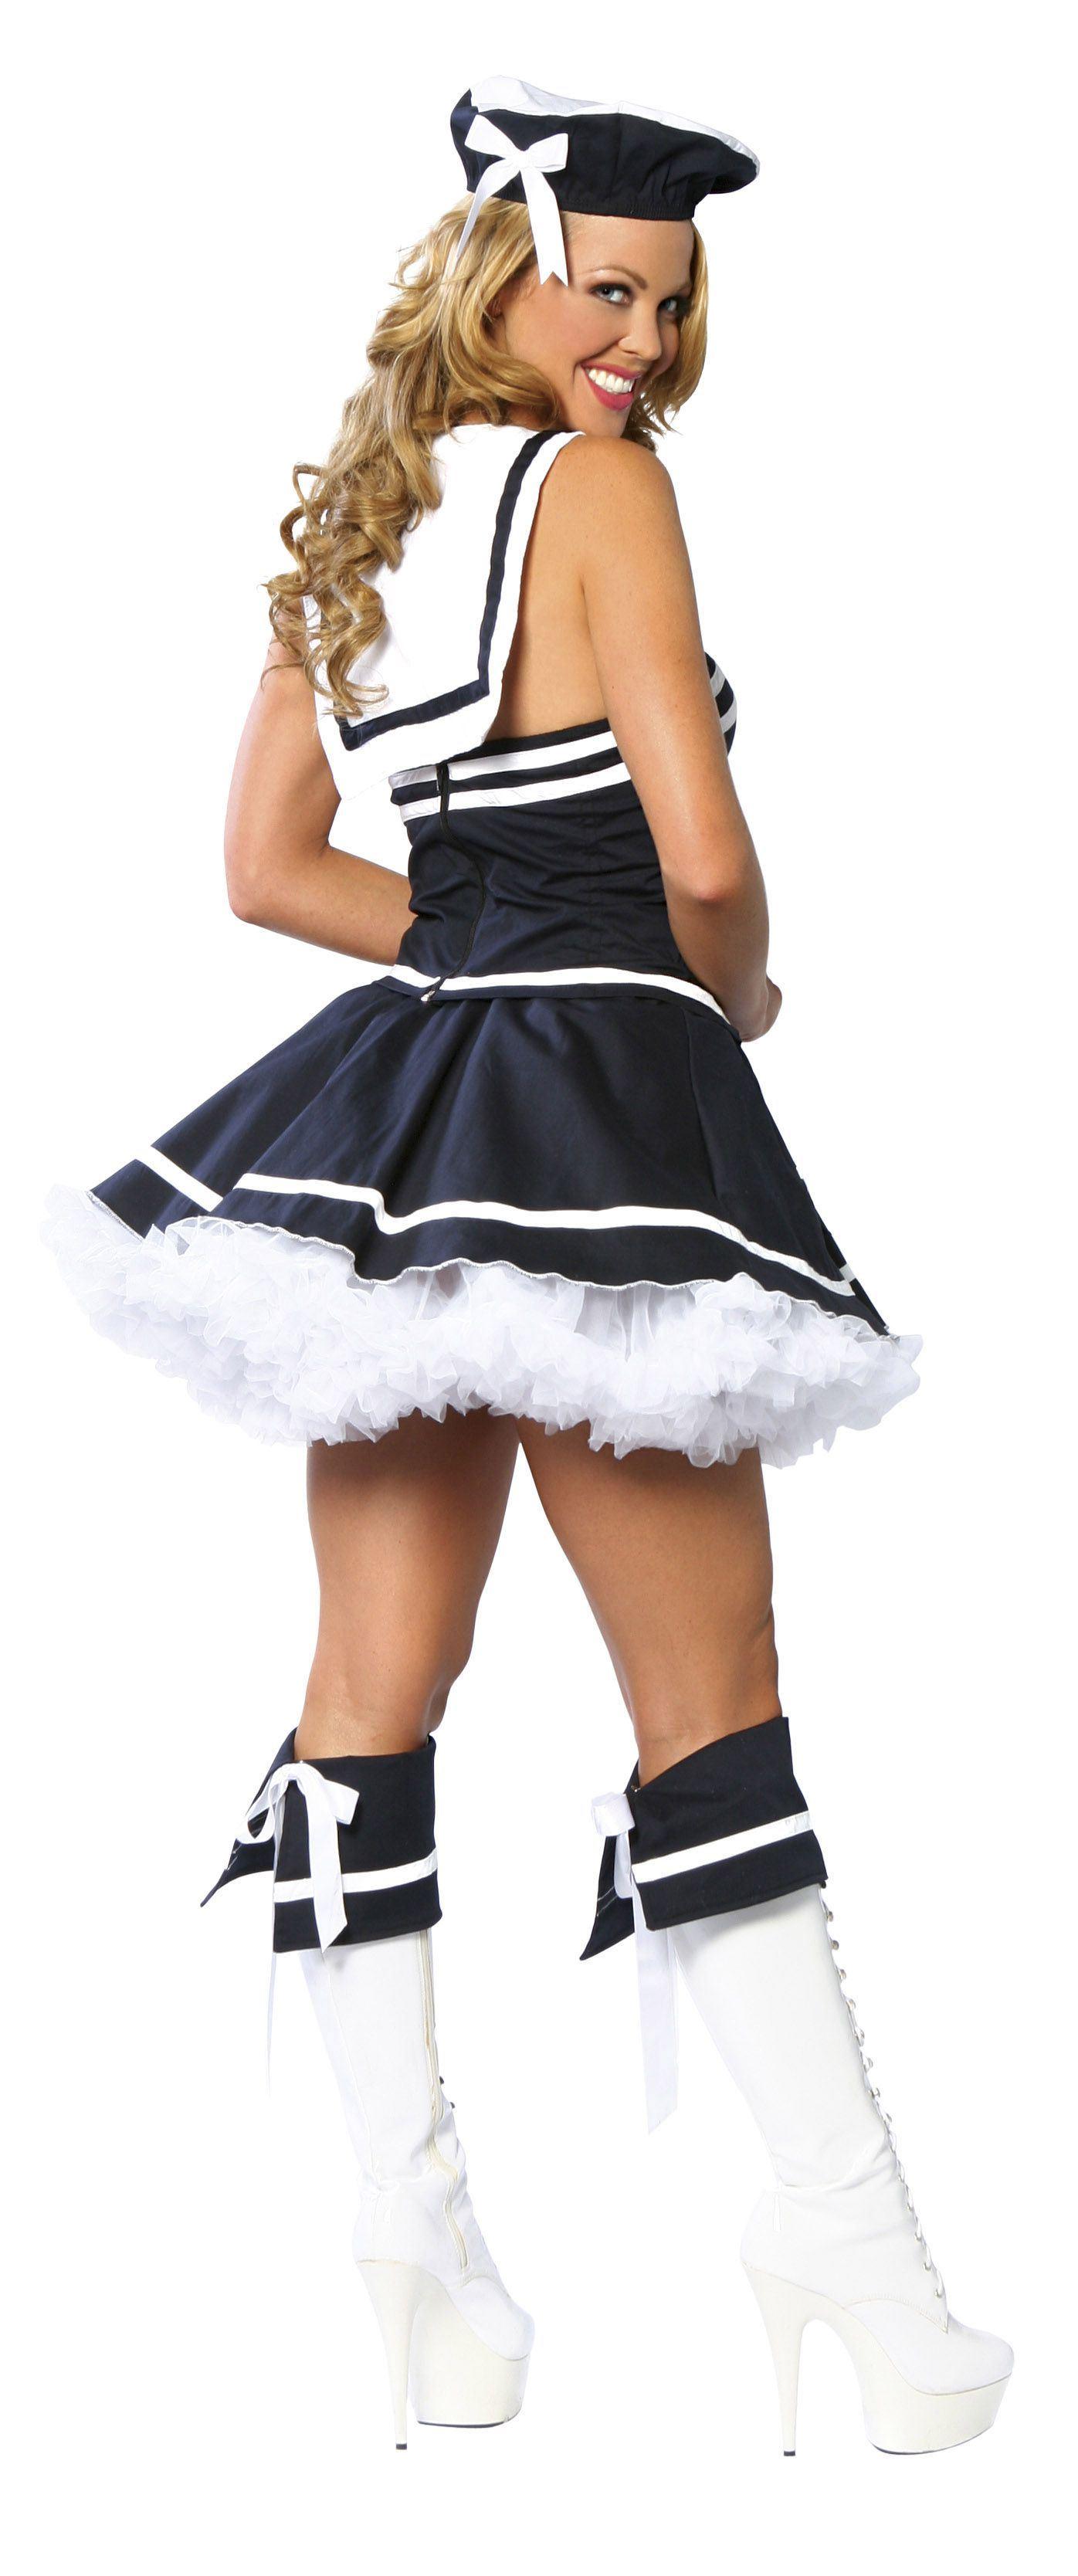 http://www.thecostumeland.com/images/zoom/rm4018-flirty-sailor-women-halloween-costumes_1.jpg